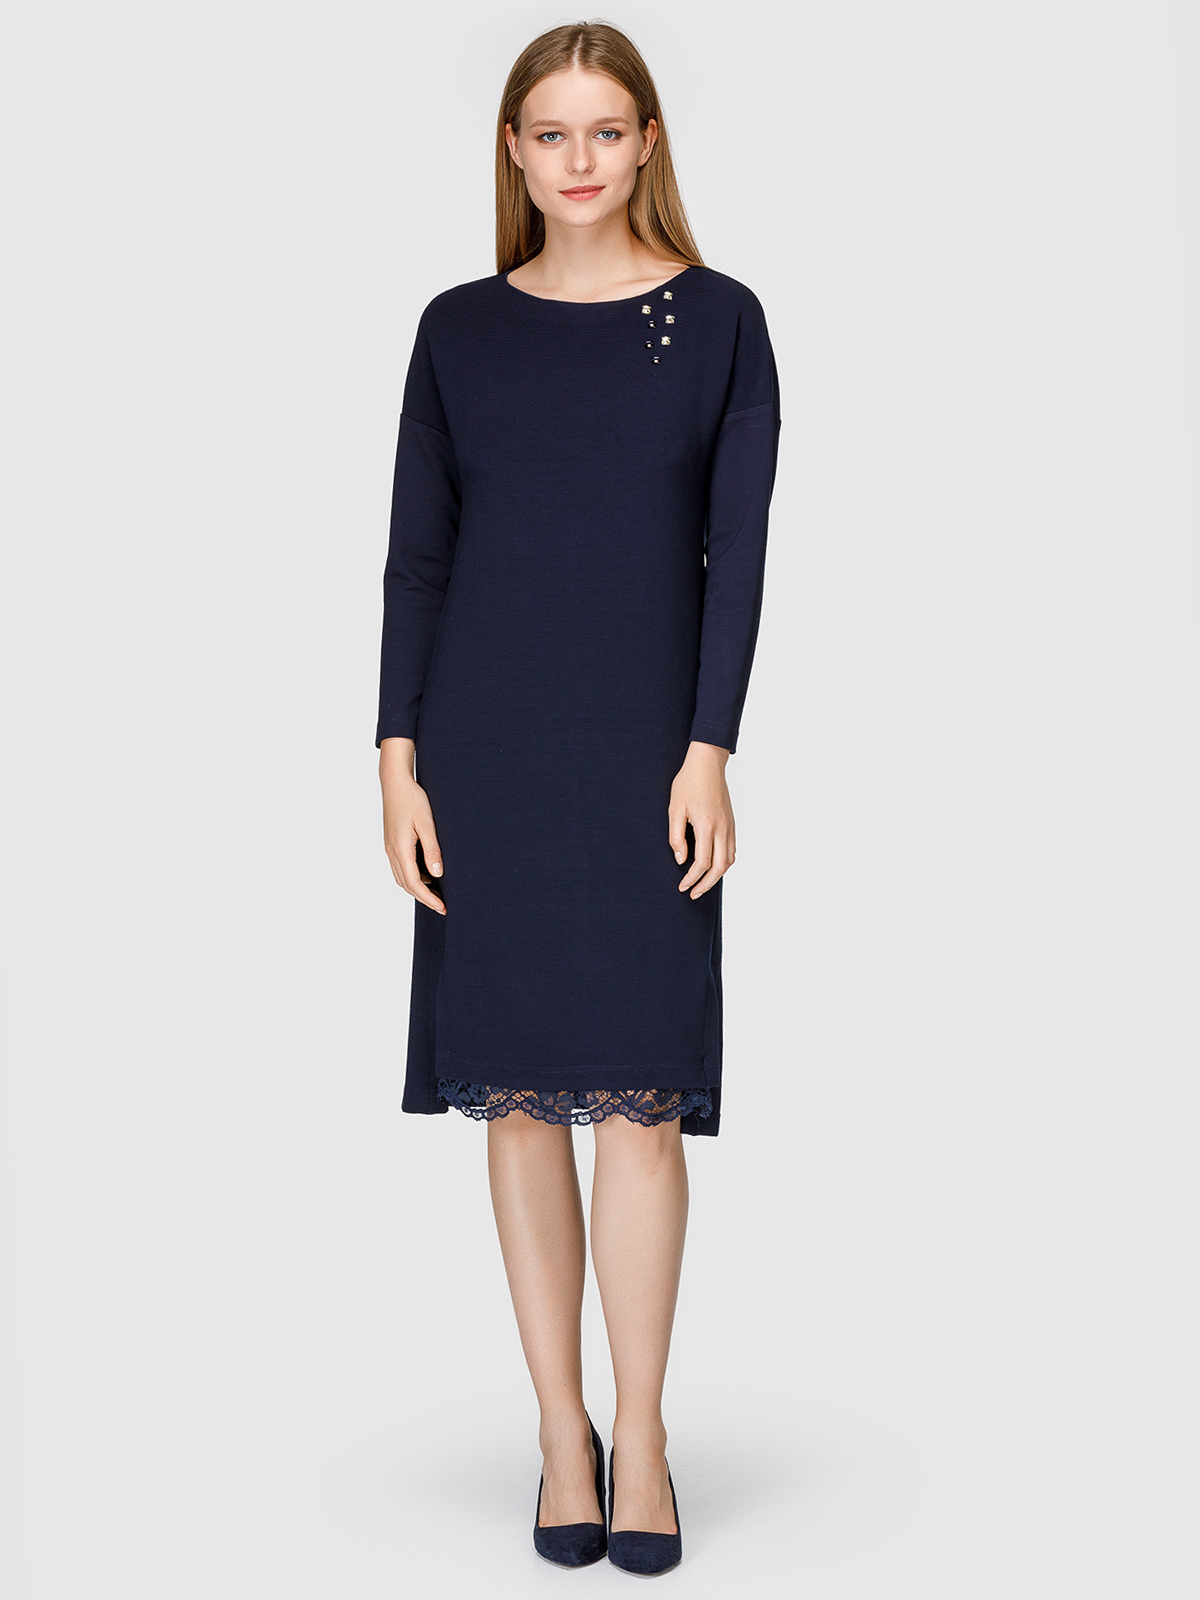 Платье женское Helmidge 7501 синее 12 UK фото